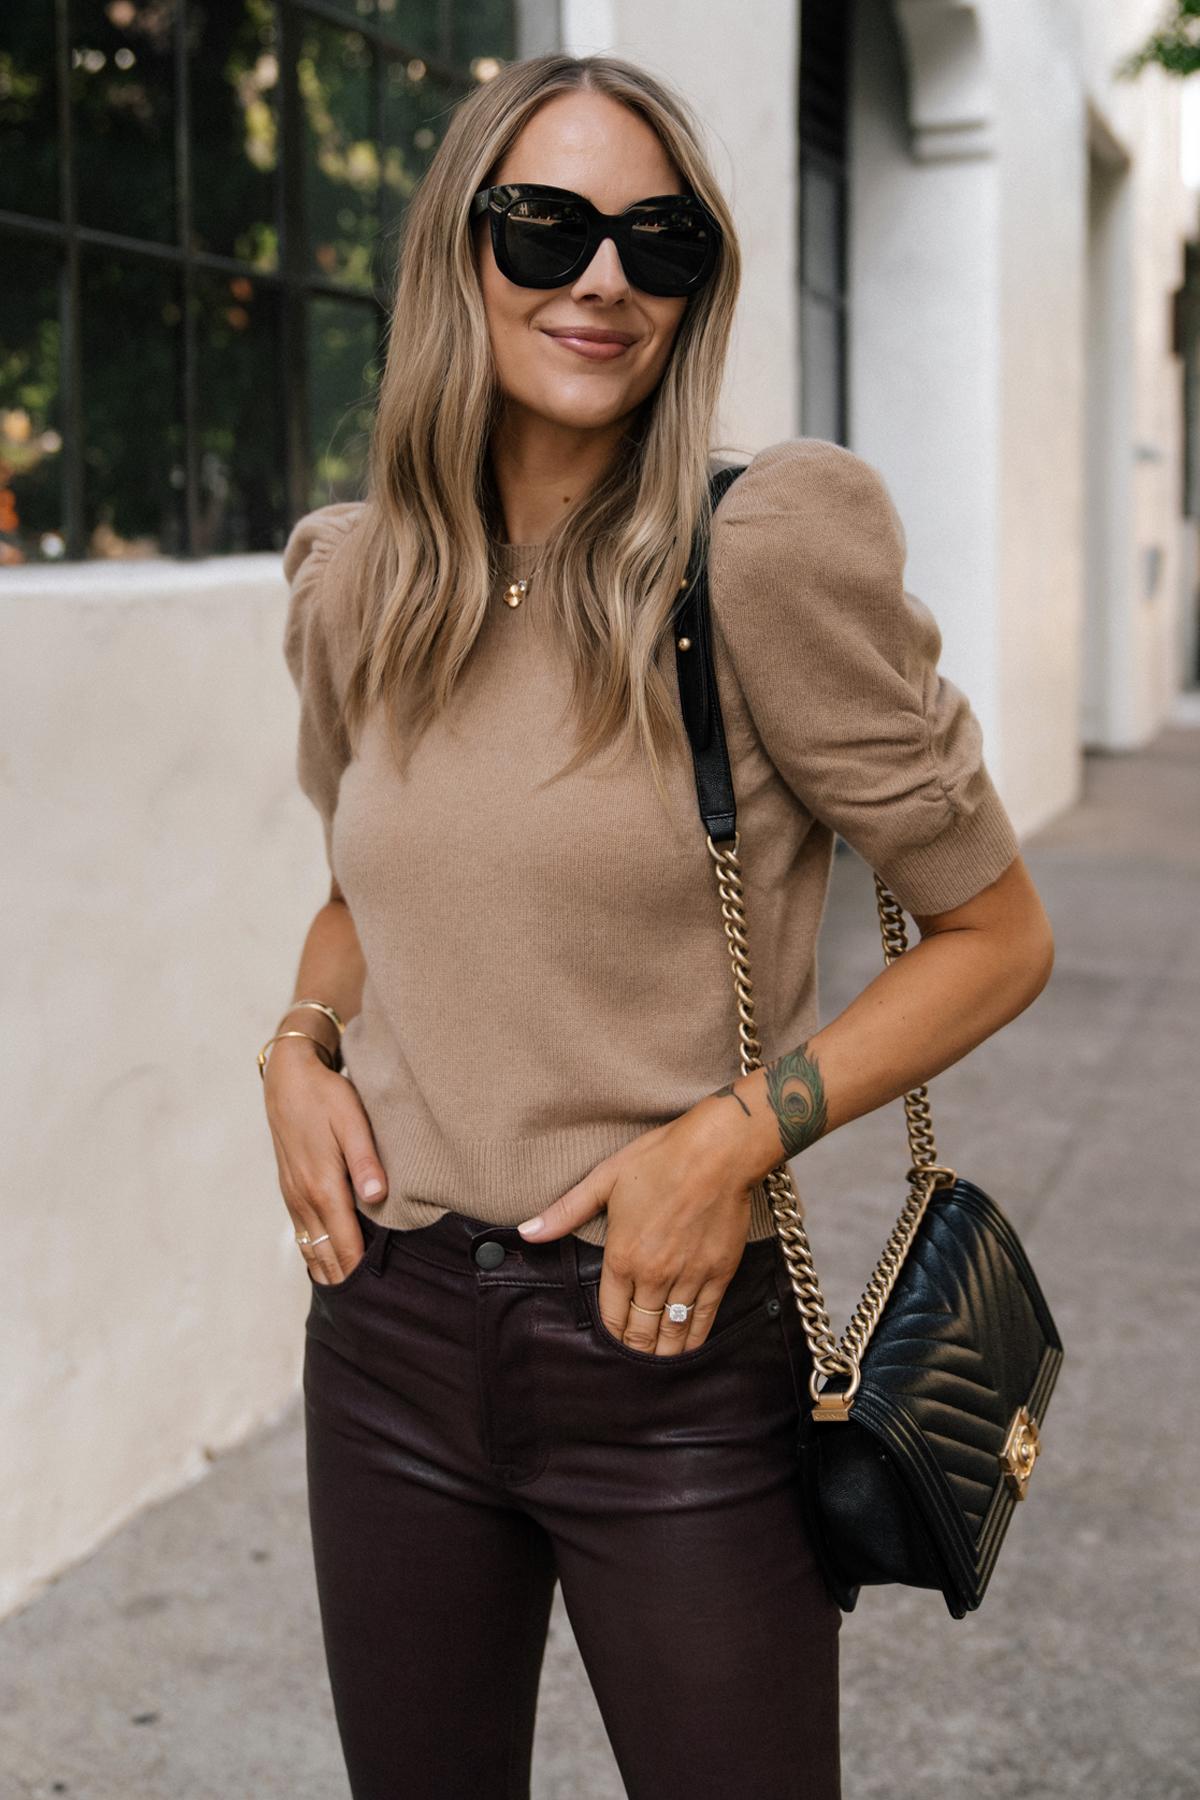 Fashion Jackson Wearing Frame Tan Short Sleeve Puff Sleeve Sweater Chanel Black Boy Bag Burgundy Leather Pants 1